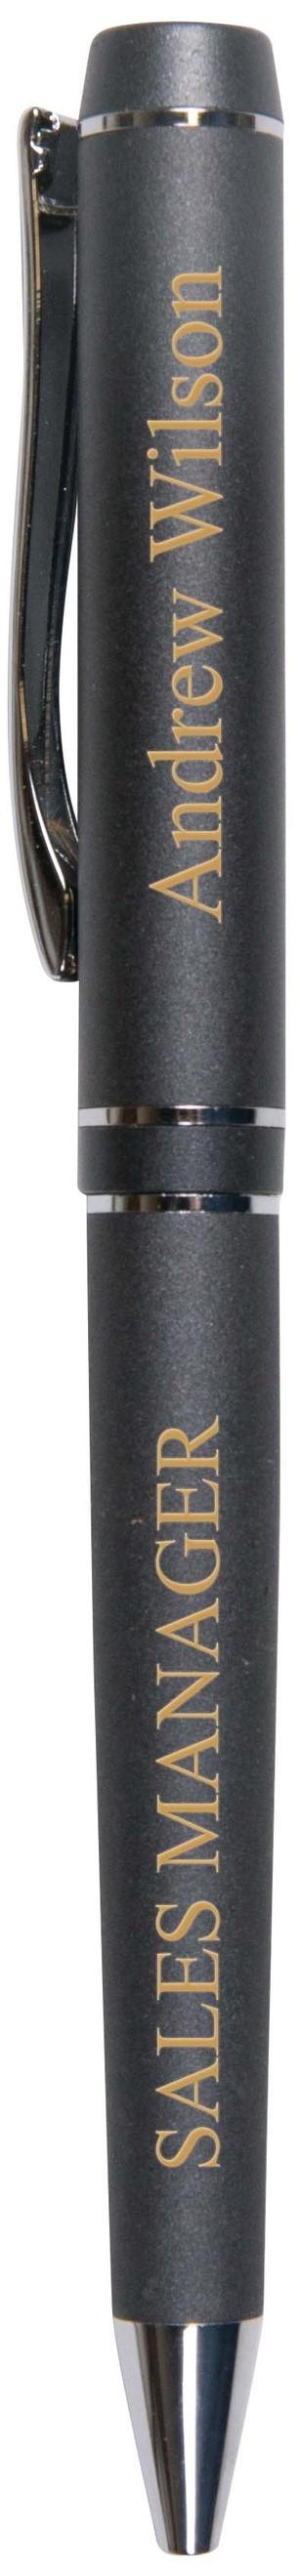 Metal Pen 7